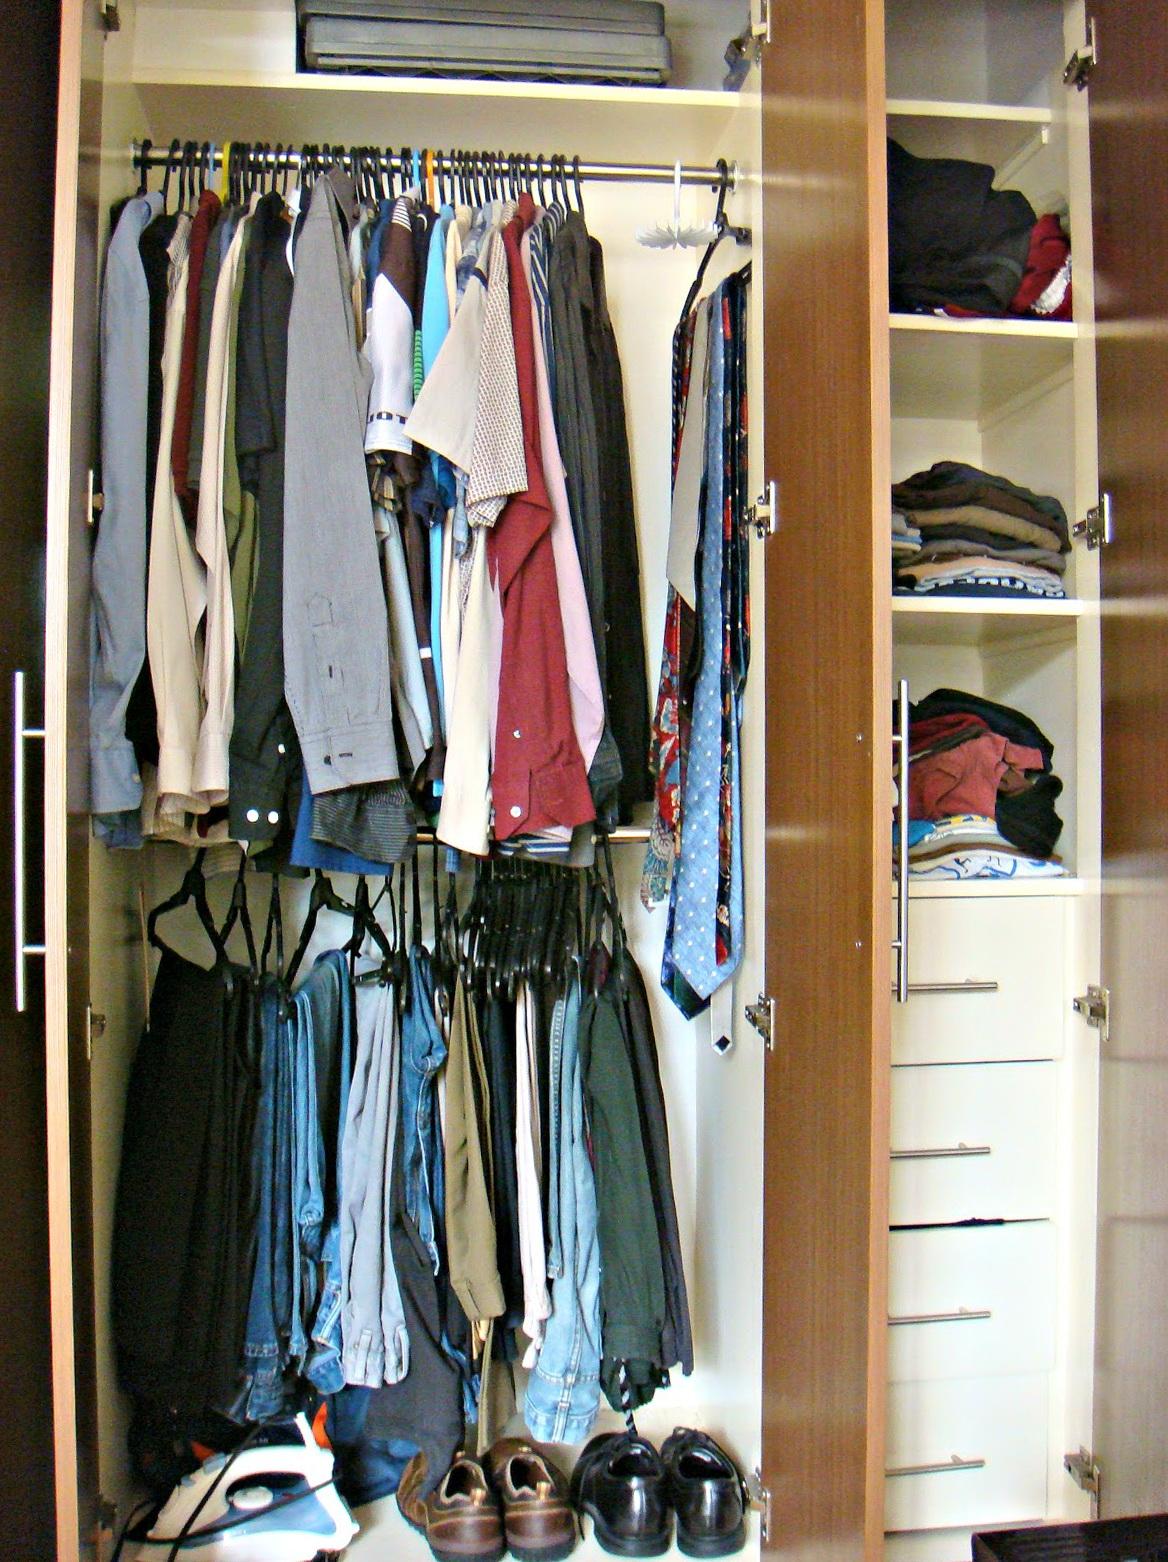 Organizing Small Closet Spaces